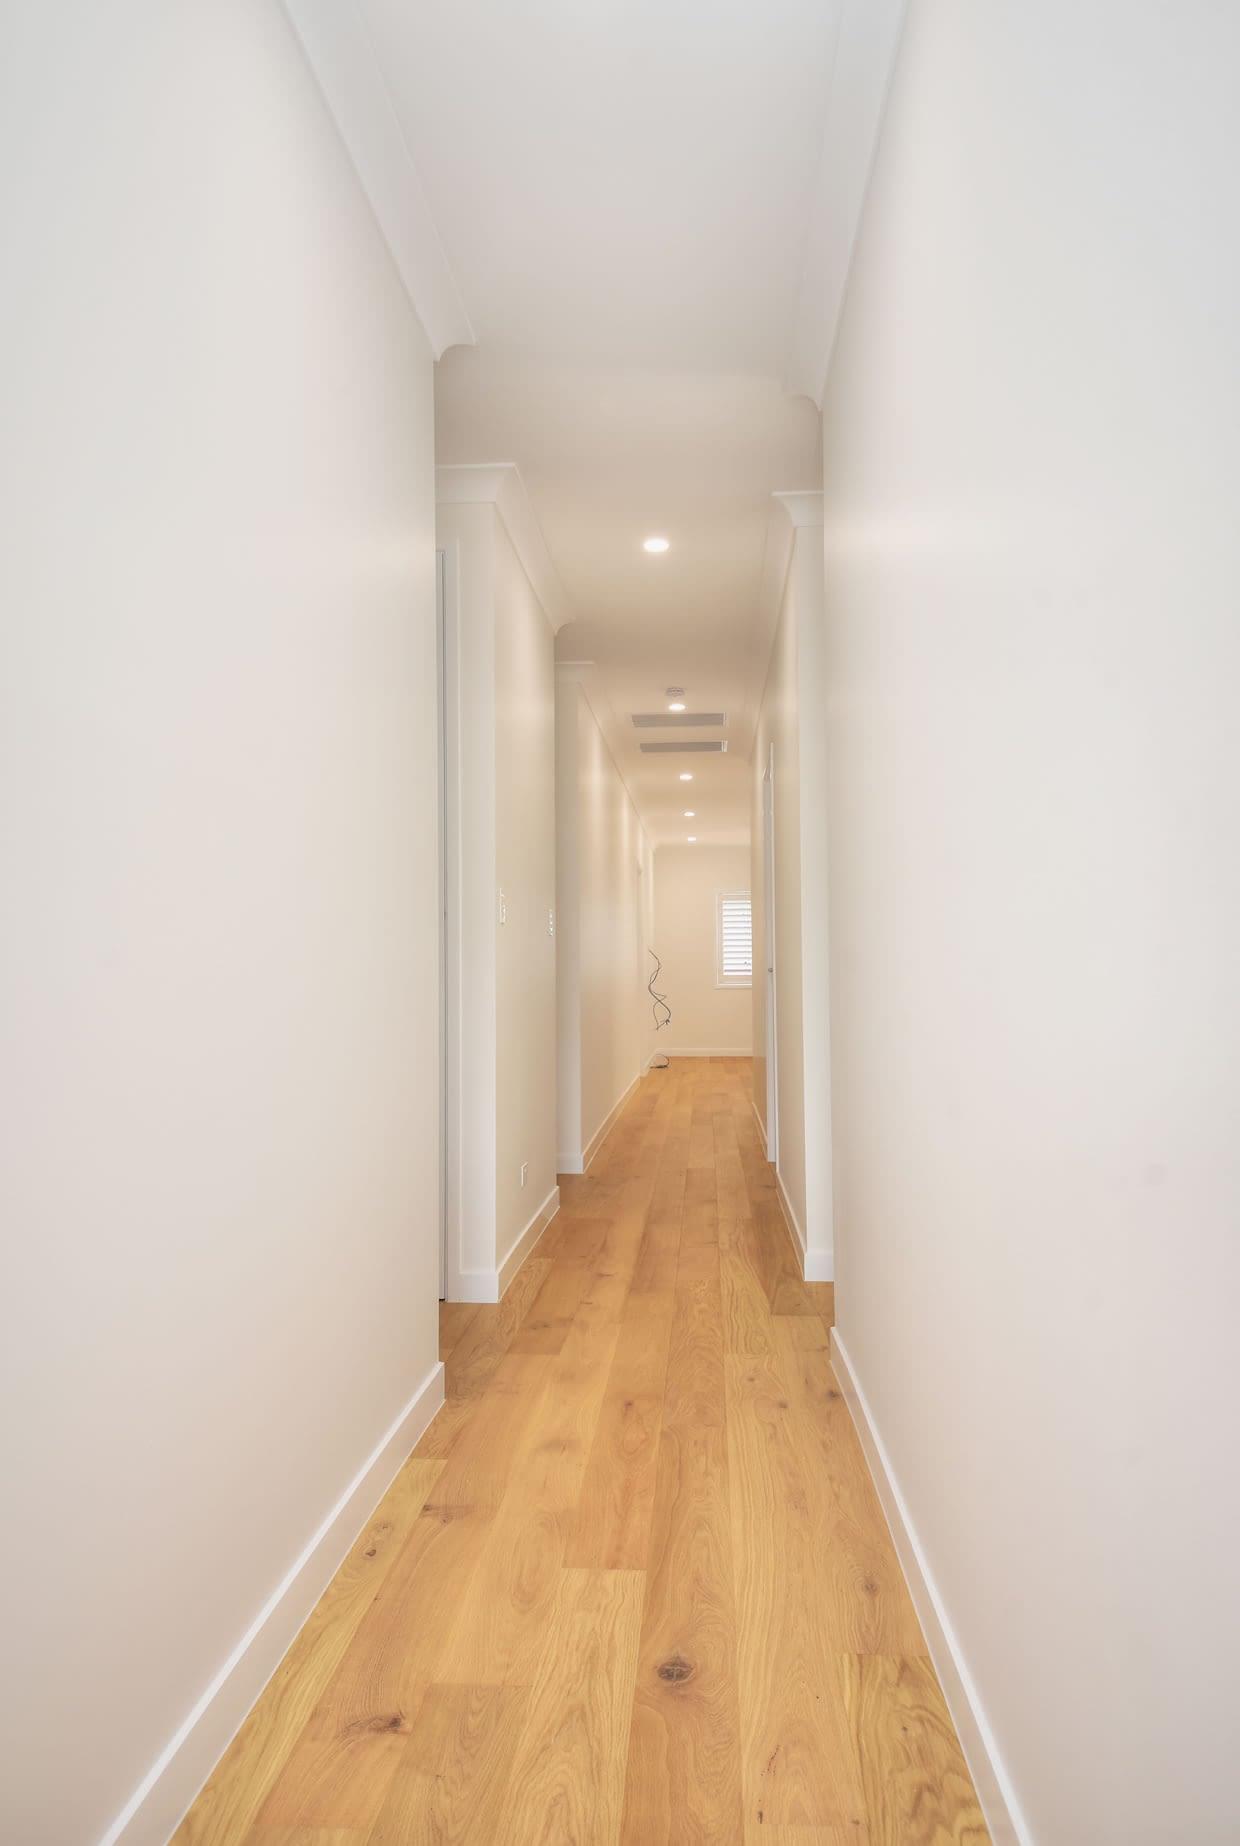 Renovation Of Hallway